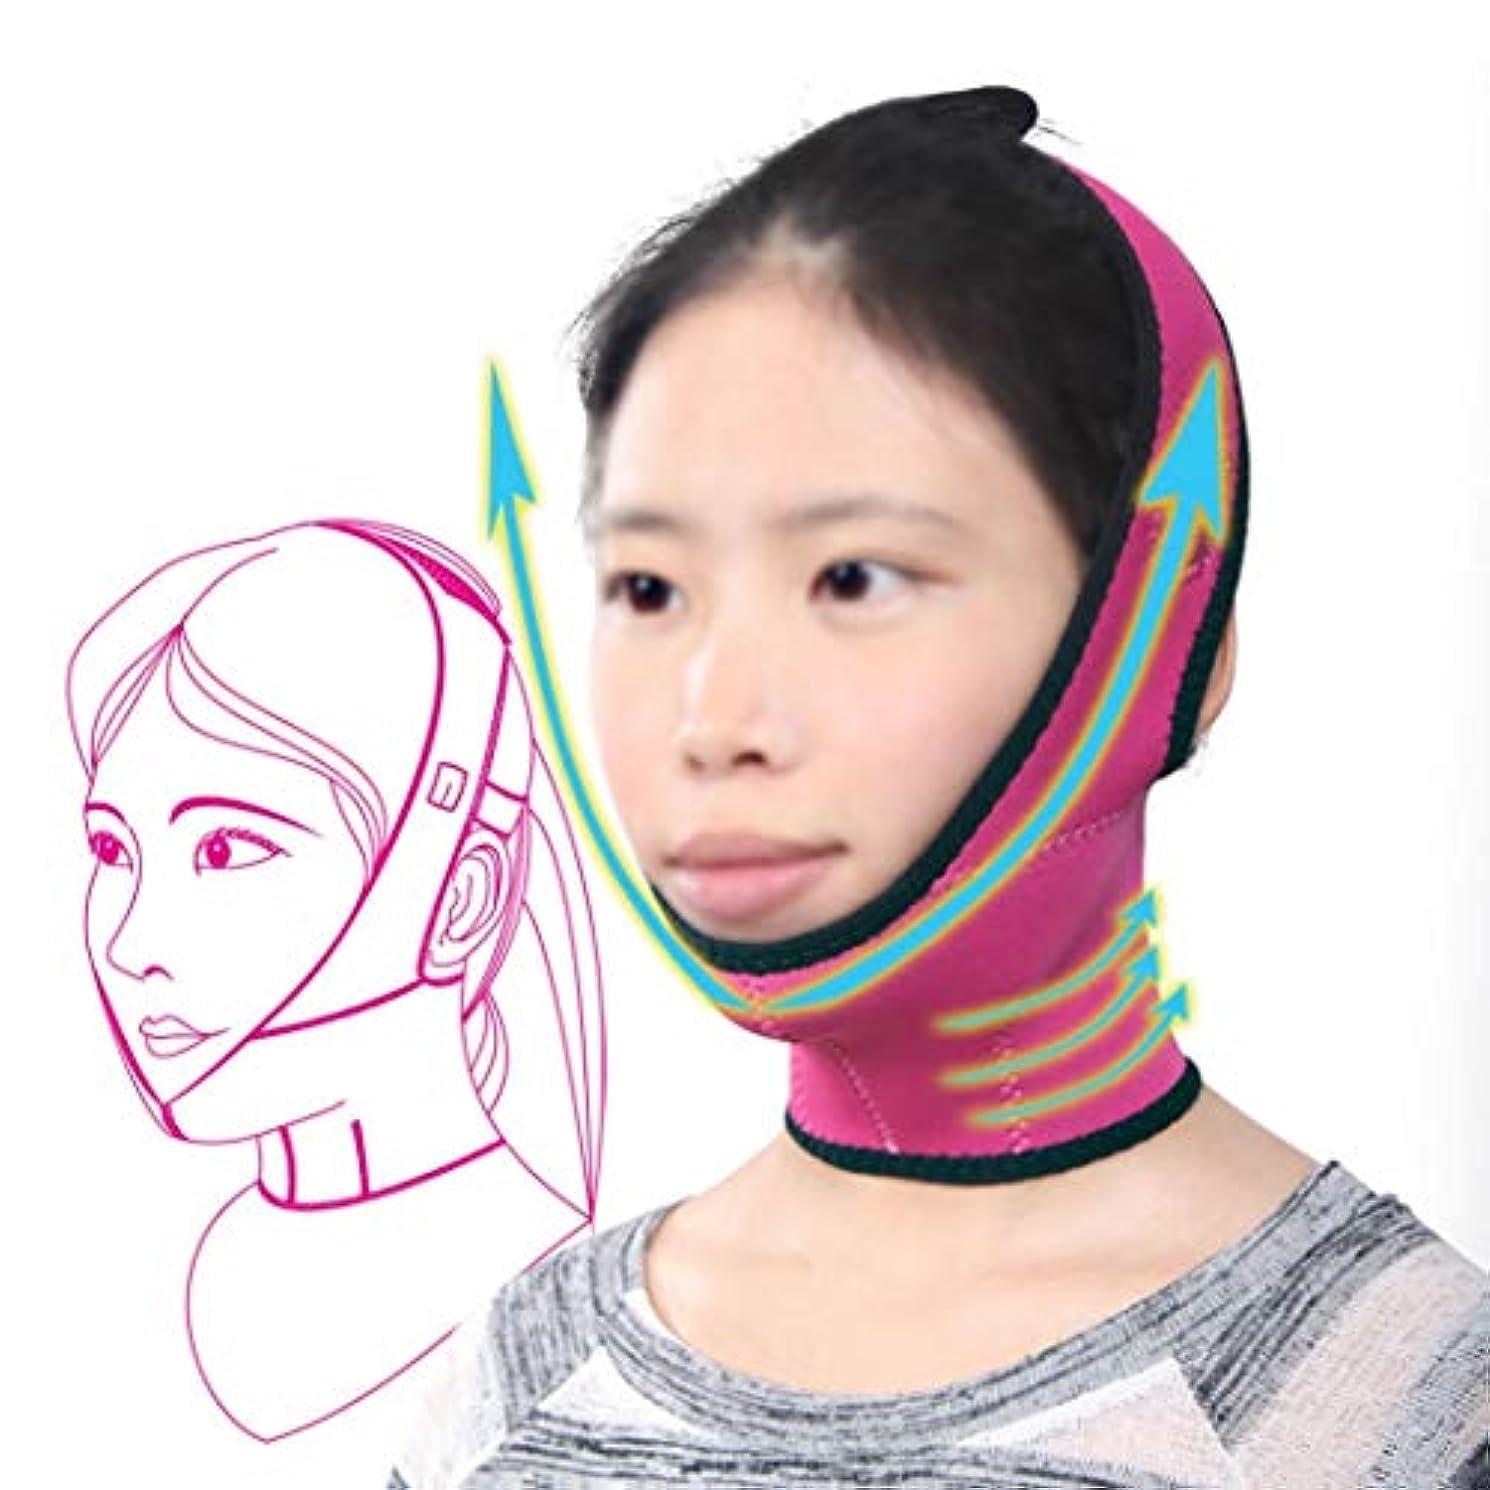 XHLMRMJ フェイスリフトマスク、痩身ベルトフェイスマスク強力なリフティング小さなV顔薄い顔包帯美容フェイスリフティング顔小さな顔薄い顔マスク